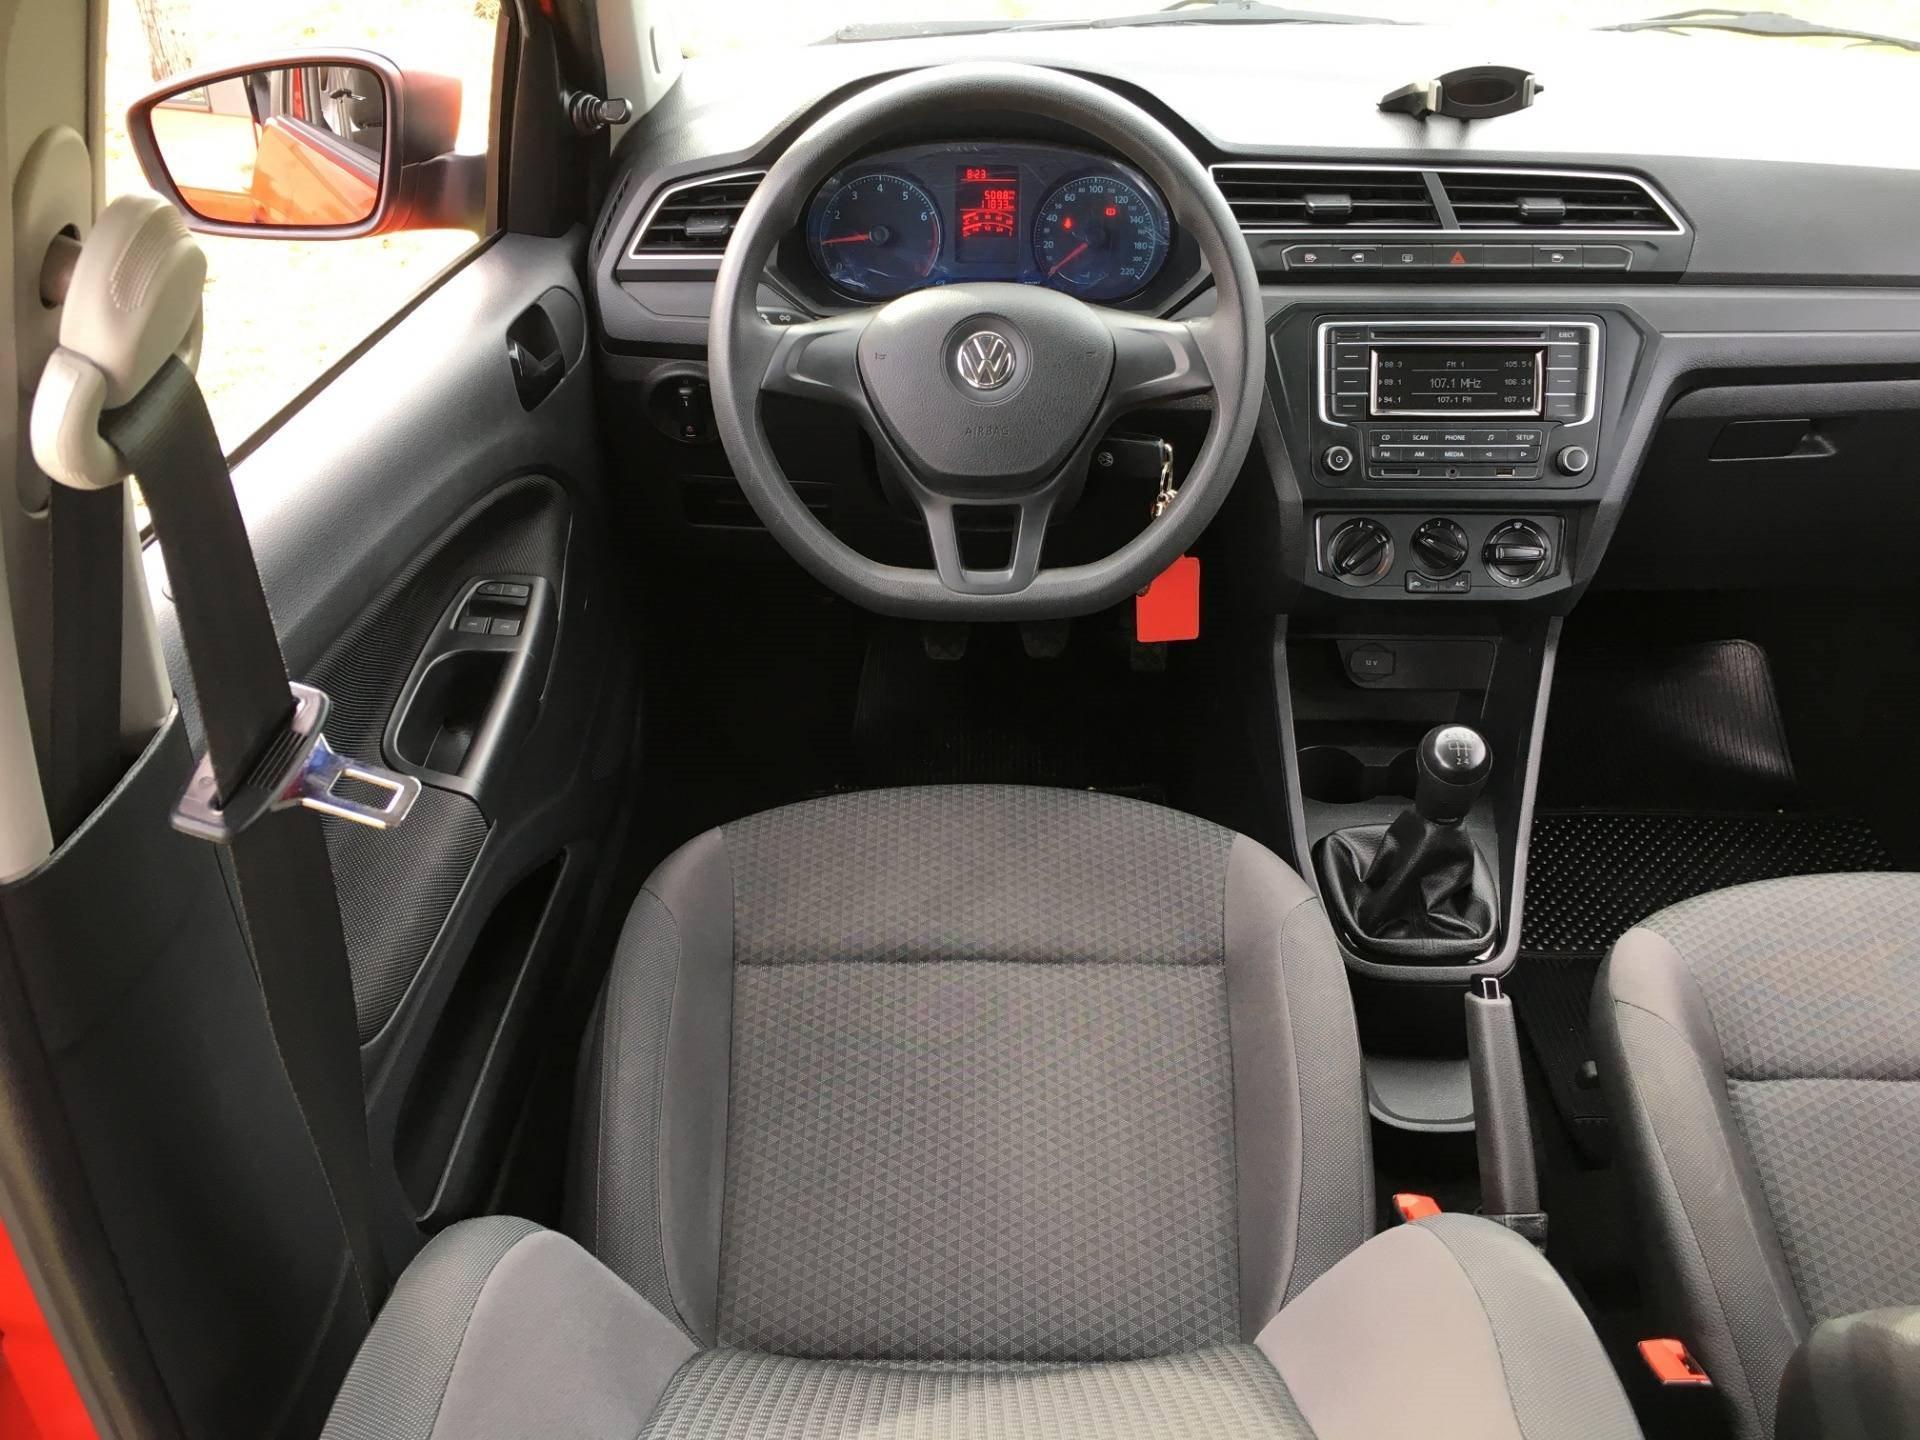 Volkswagen Gol 1.0 12v Mpi Totalflex 4p Manual Wmimagem10592483586